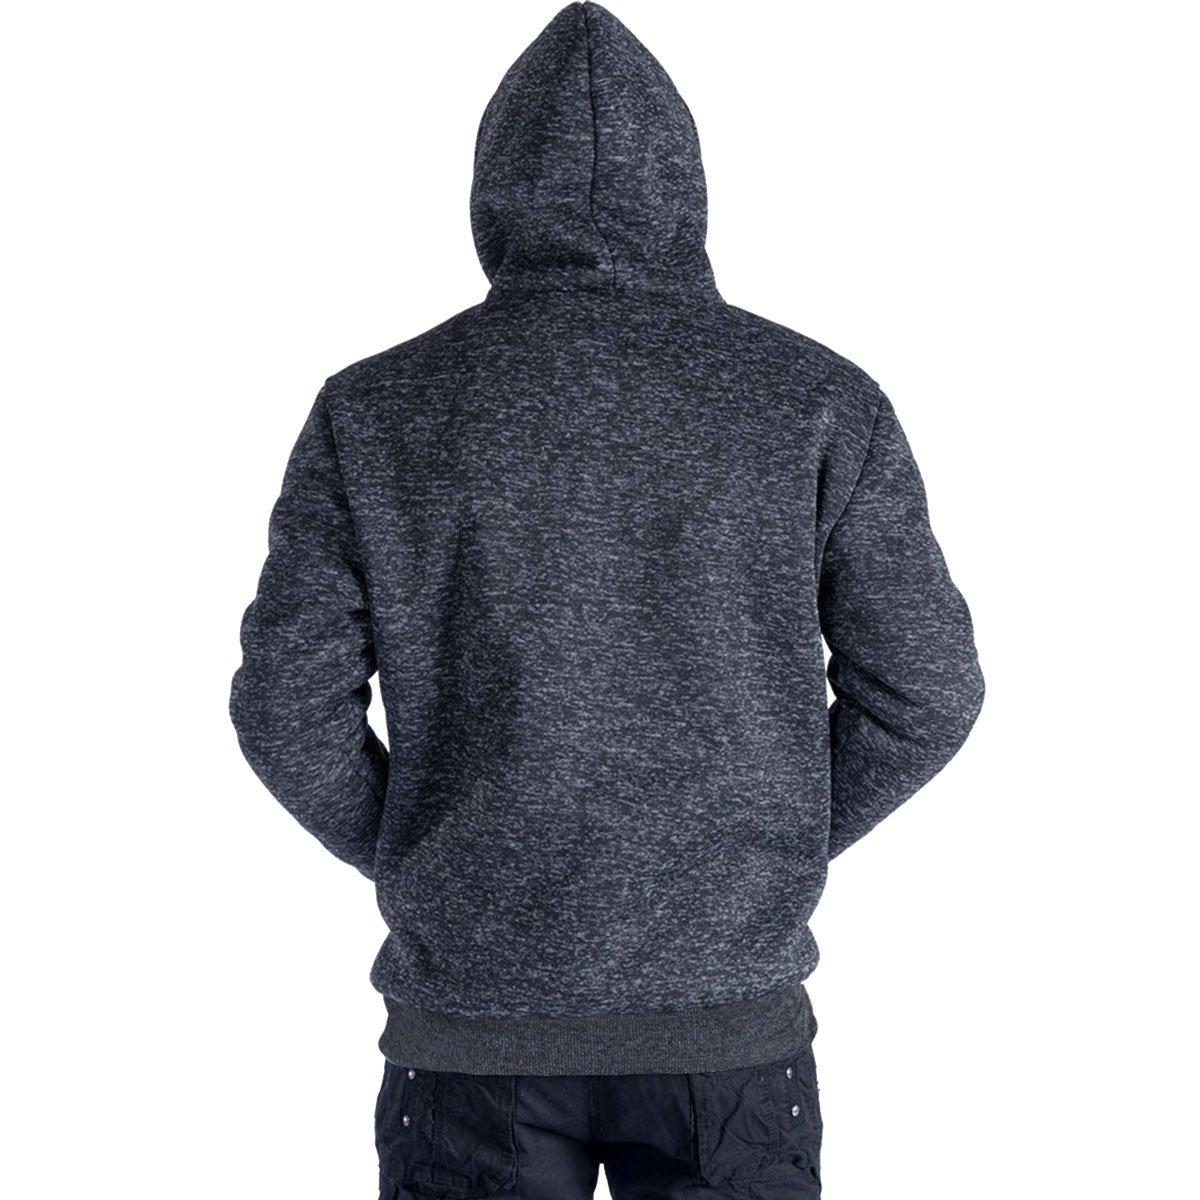 da0813f61e5 Eurogarment Plus Size S-5XL Marled Heavyweight Fleece Hoodie for Men Sherpa  Lined Full Zip